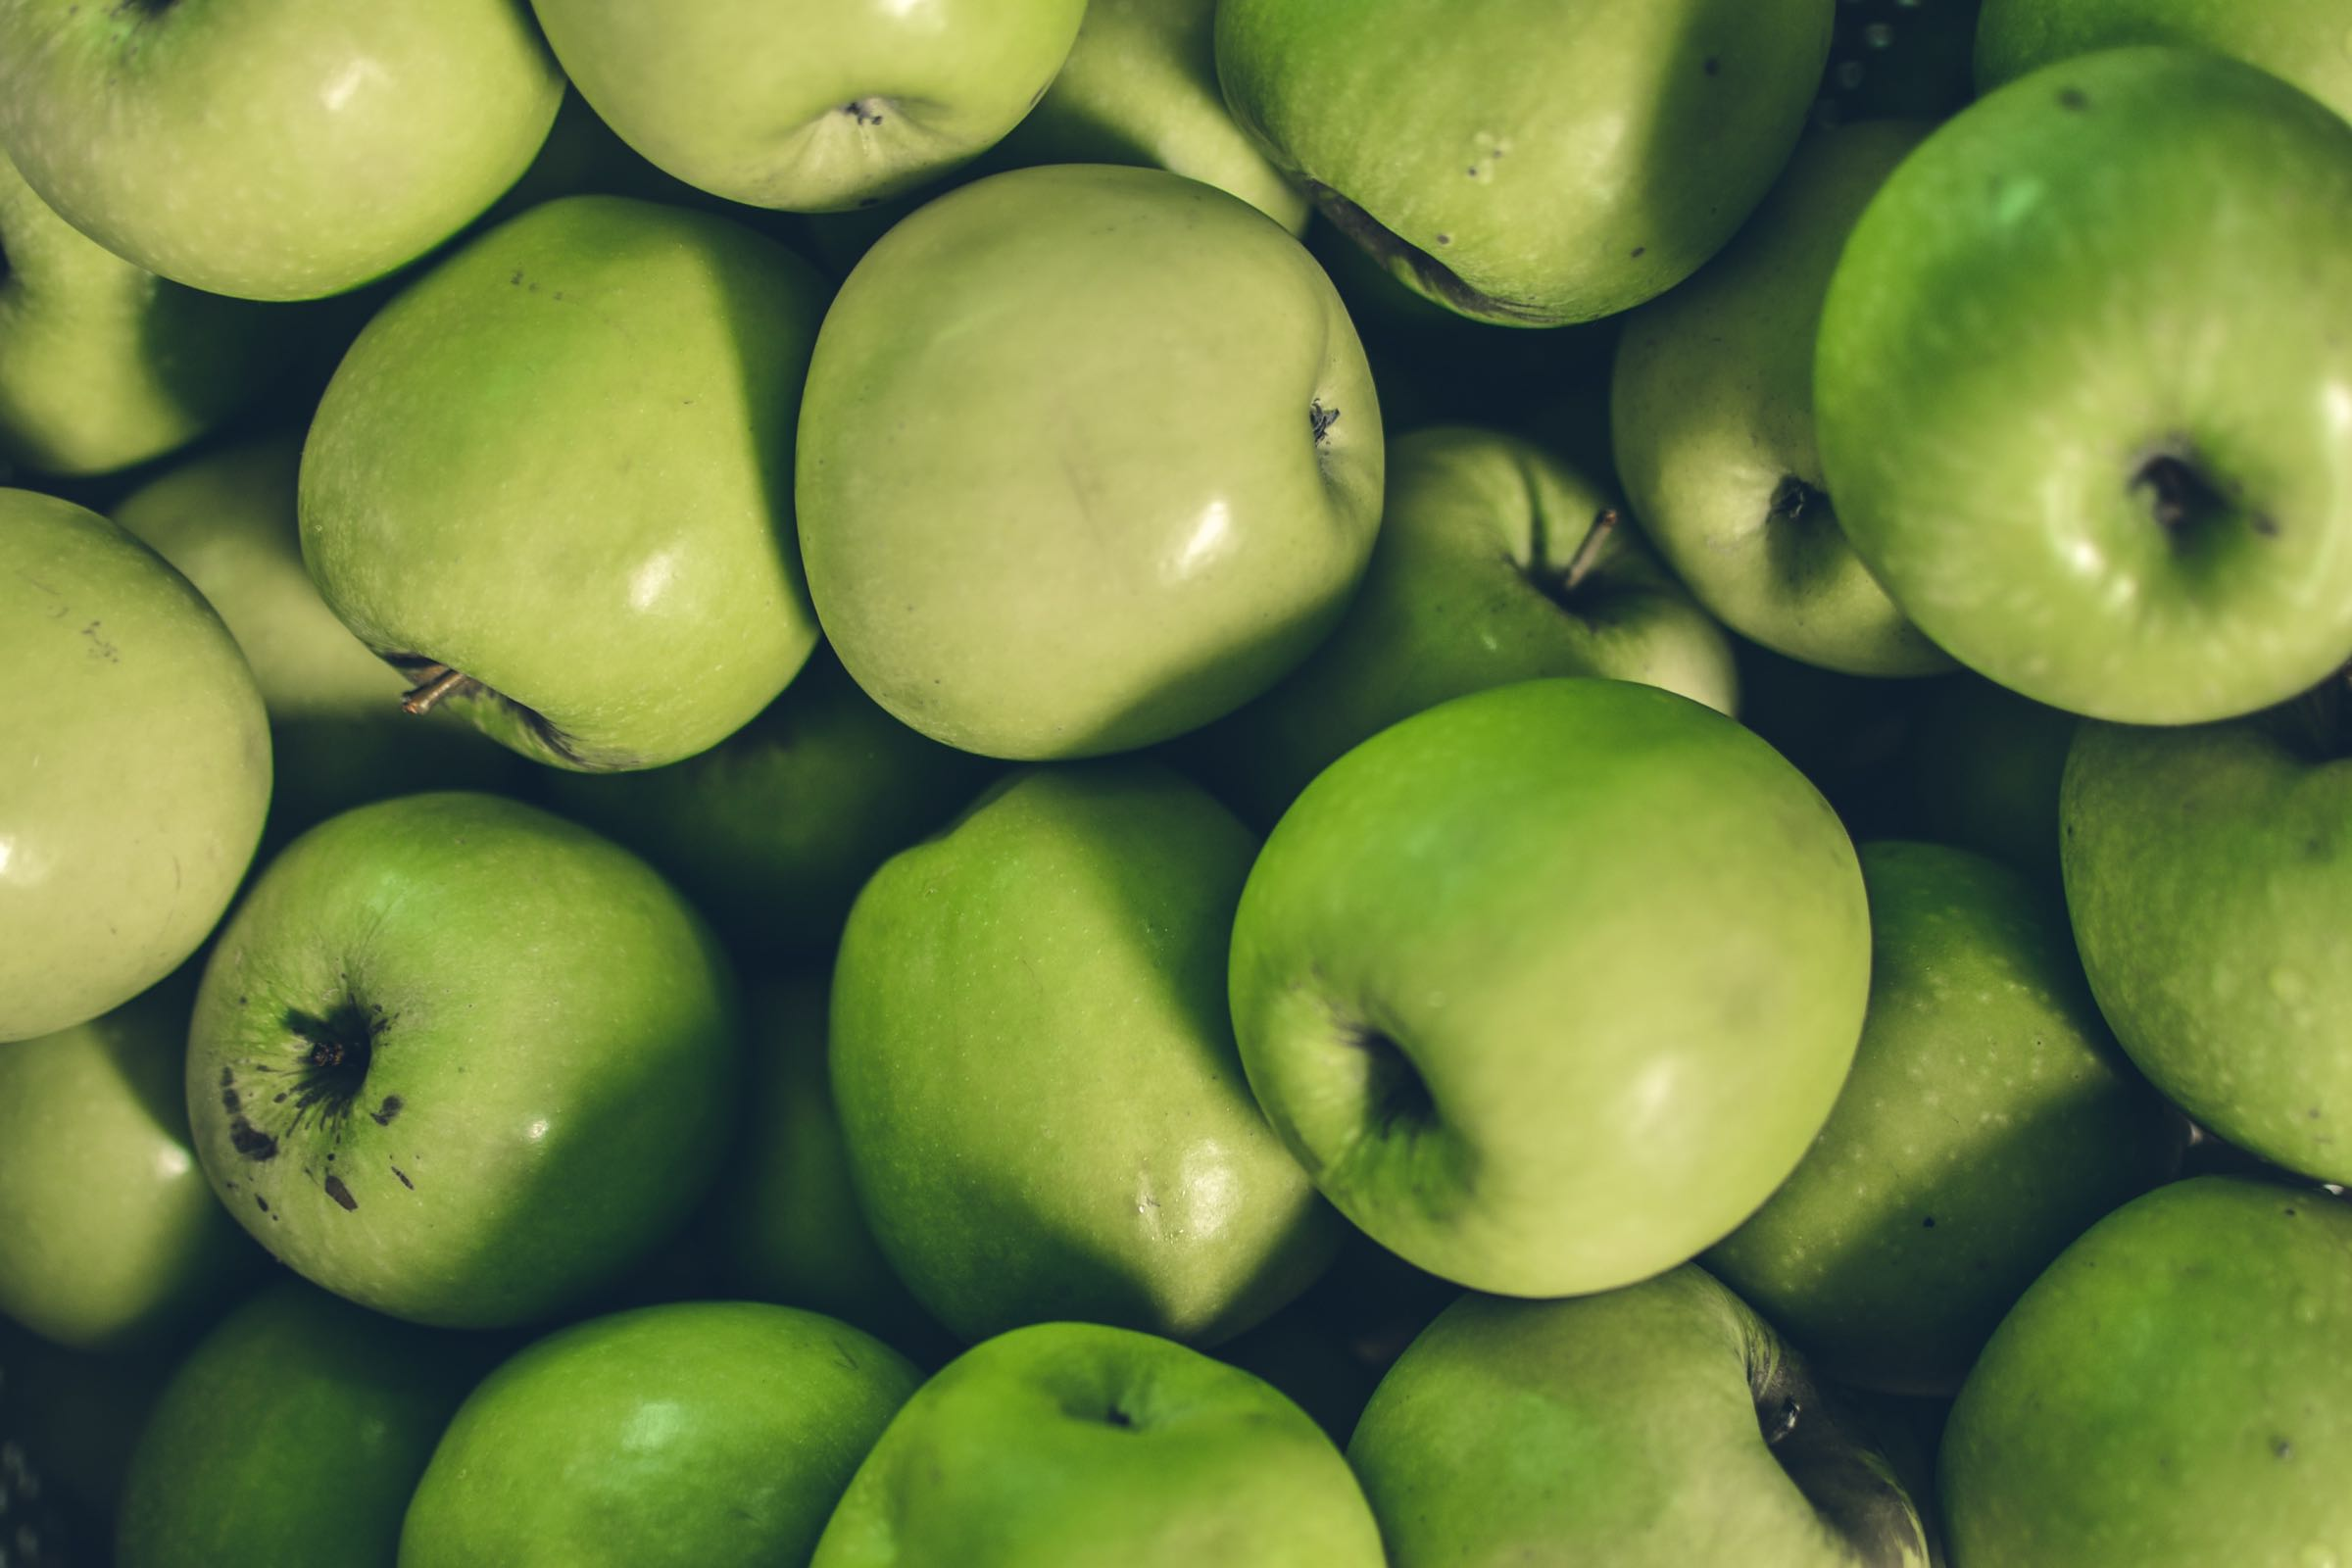 1kg Green Apples